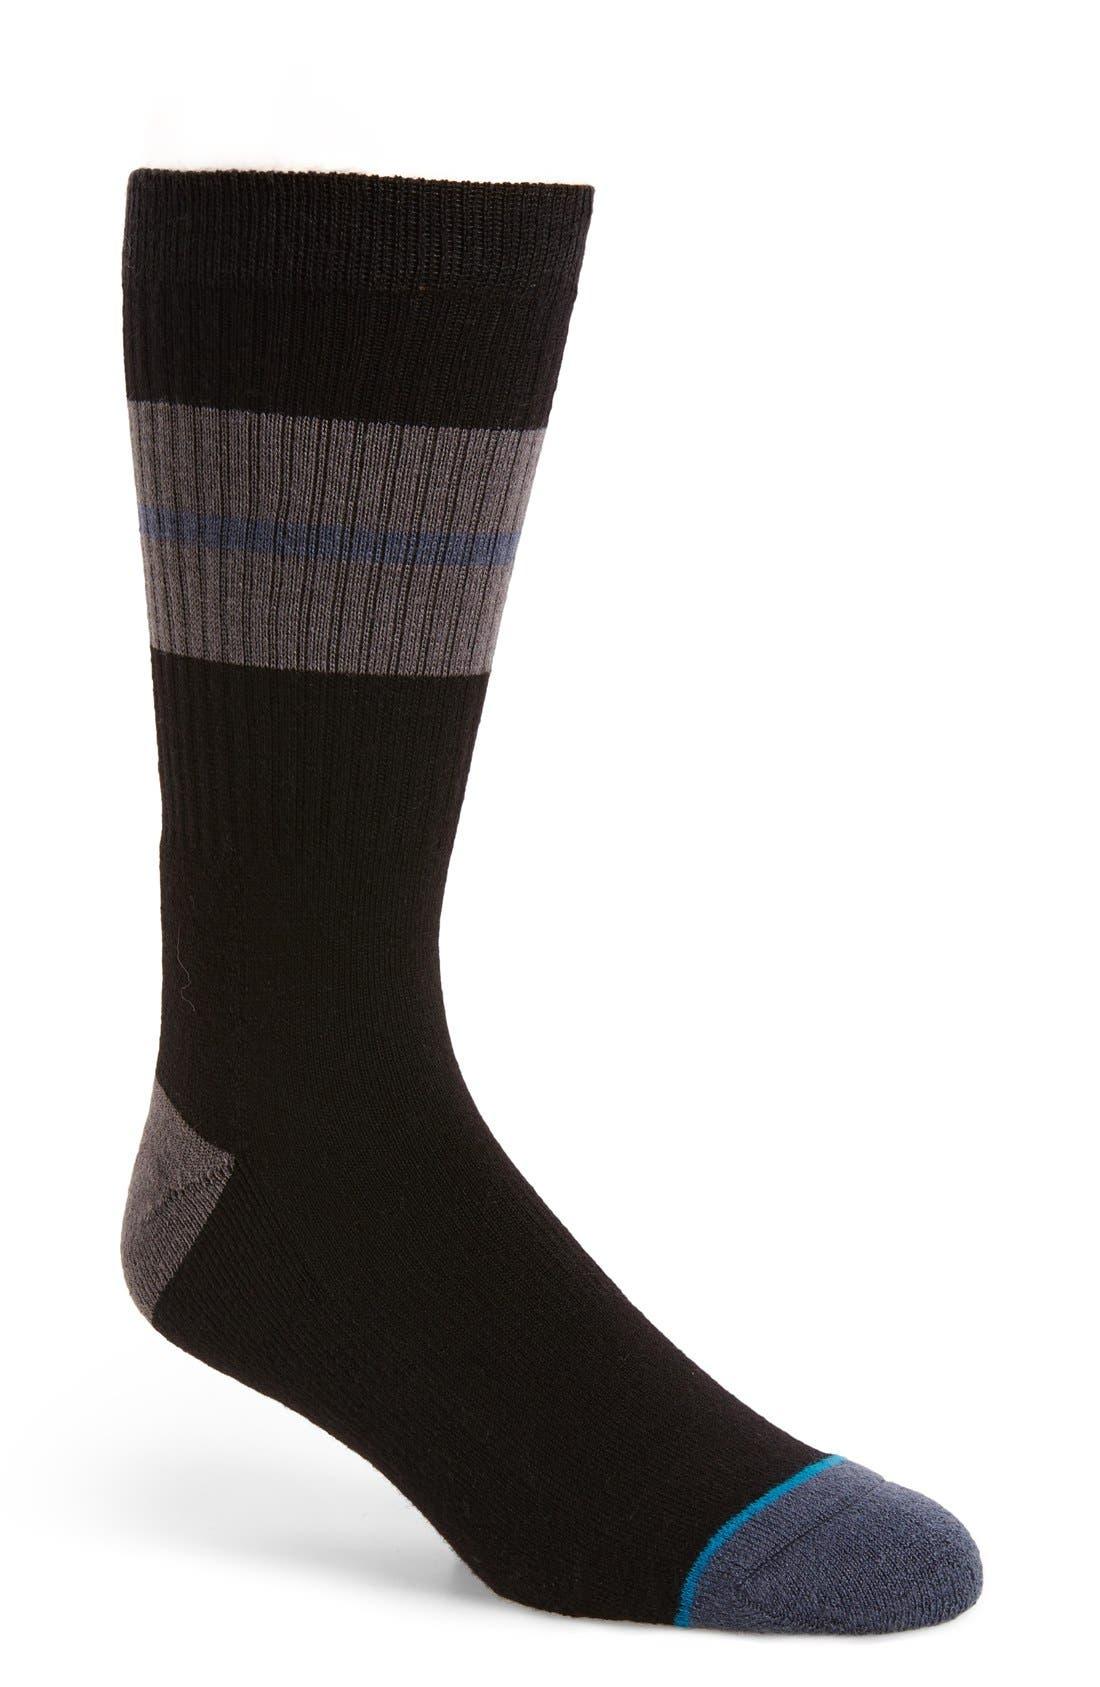 Main Image - Stance Sequoia Classic Crew Socks